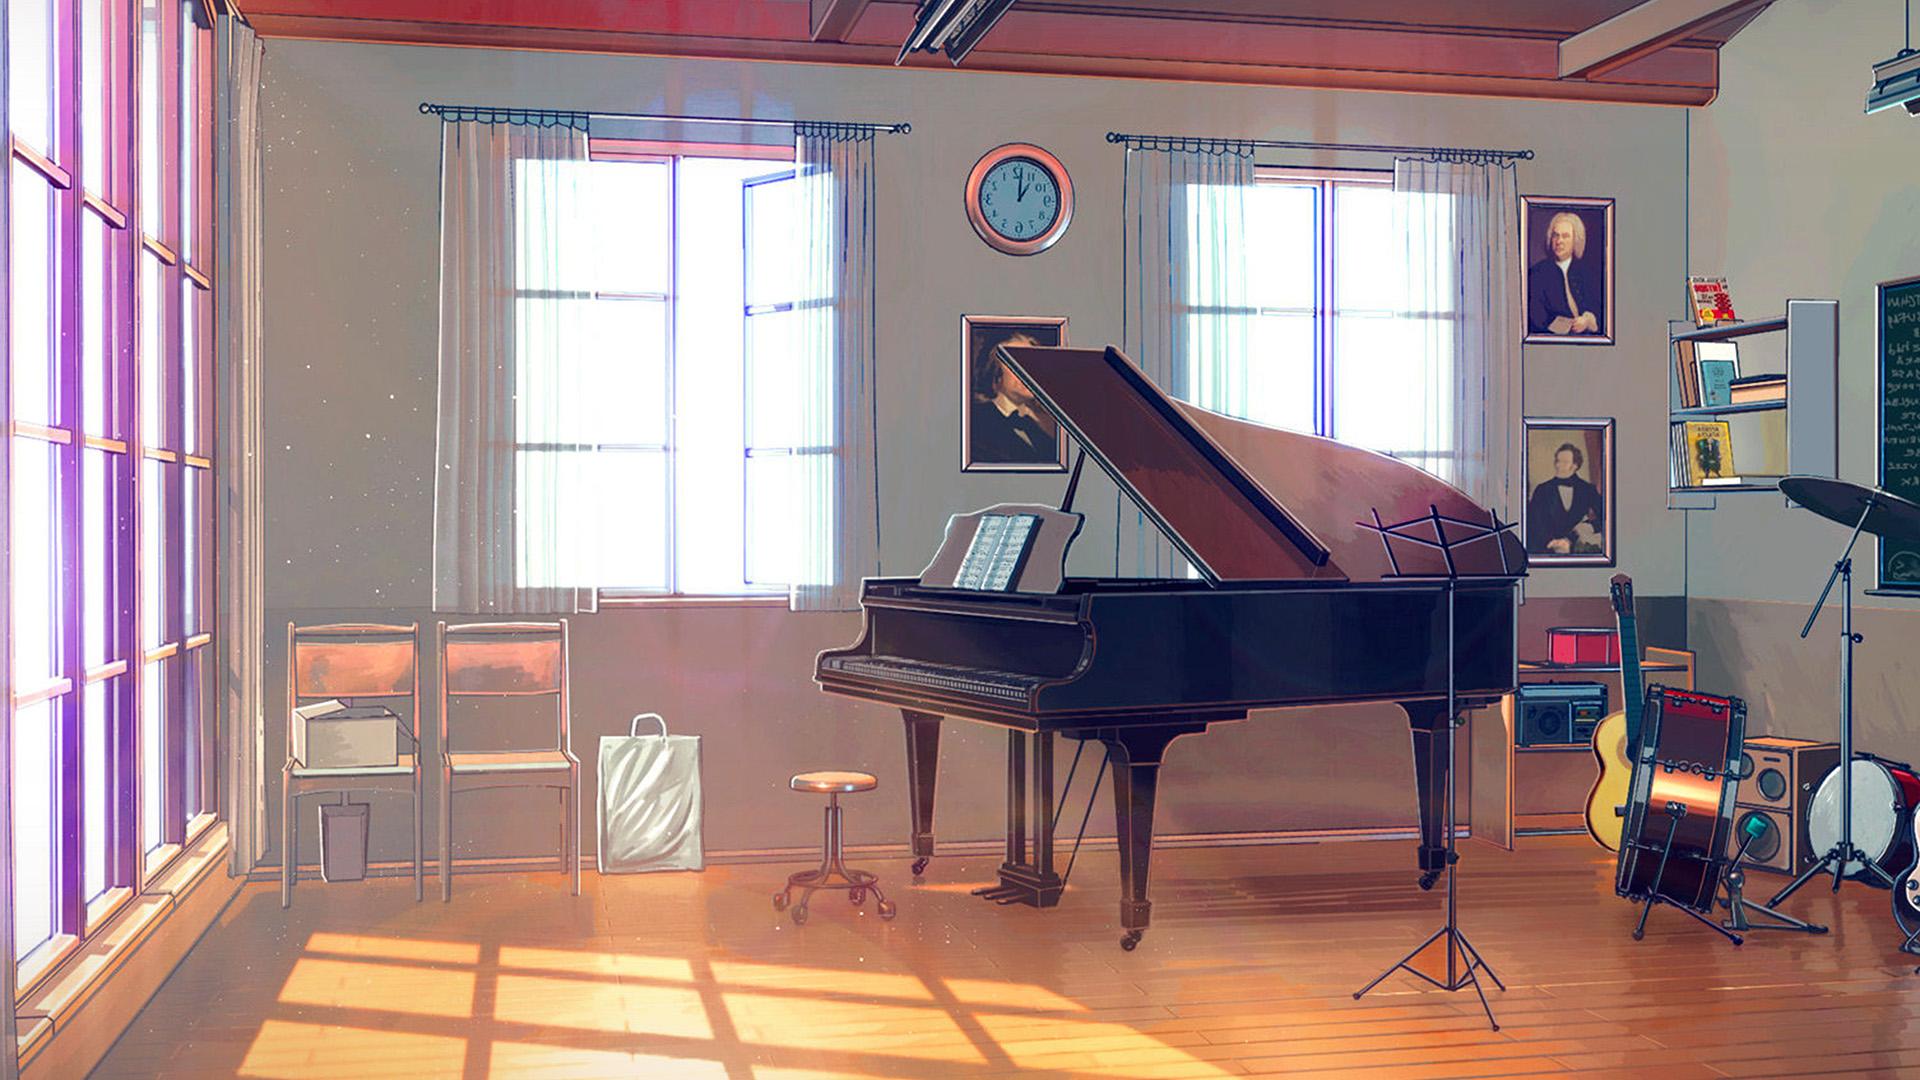 aw49-arseniy-chebynkin-music-room-piano-illustration-art ...